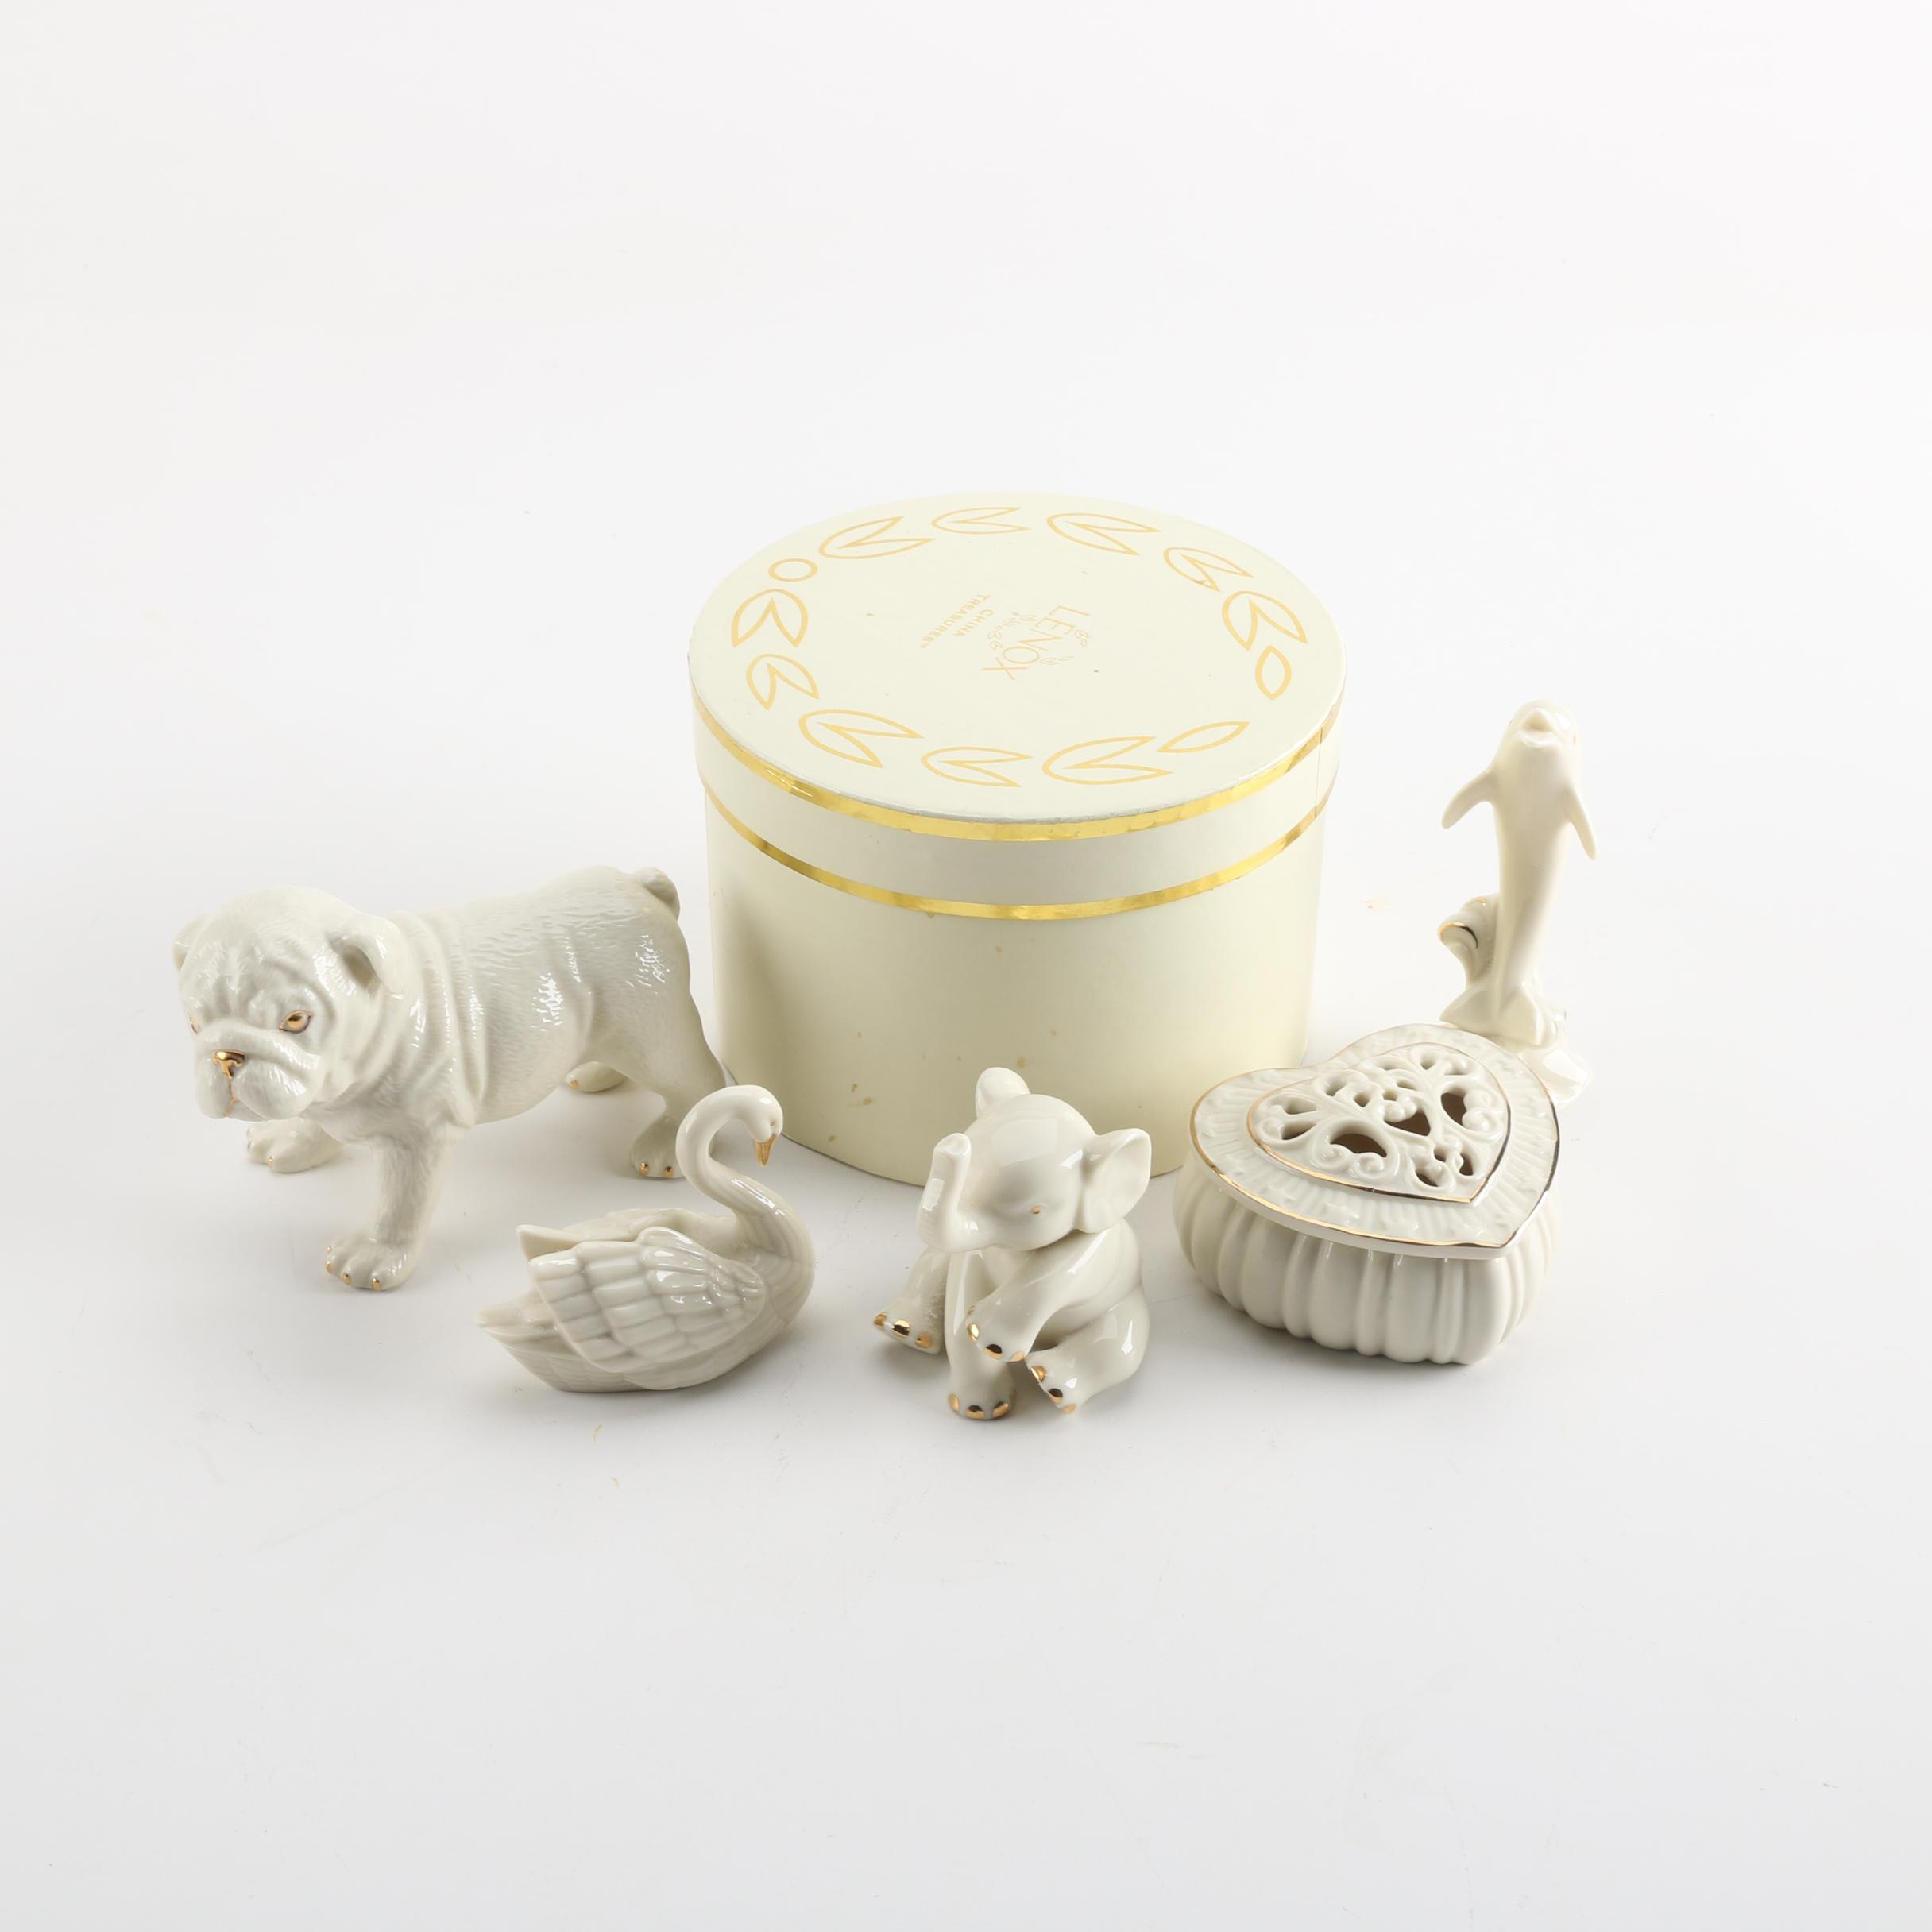 Lenox Porcelain Figurines and Trinket Box